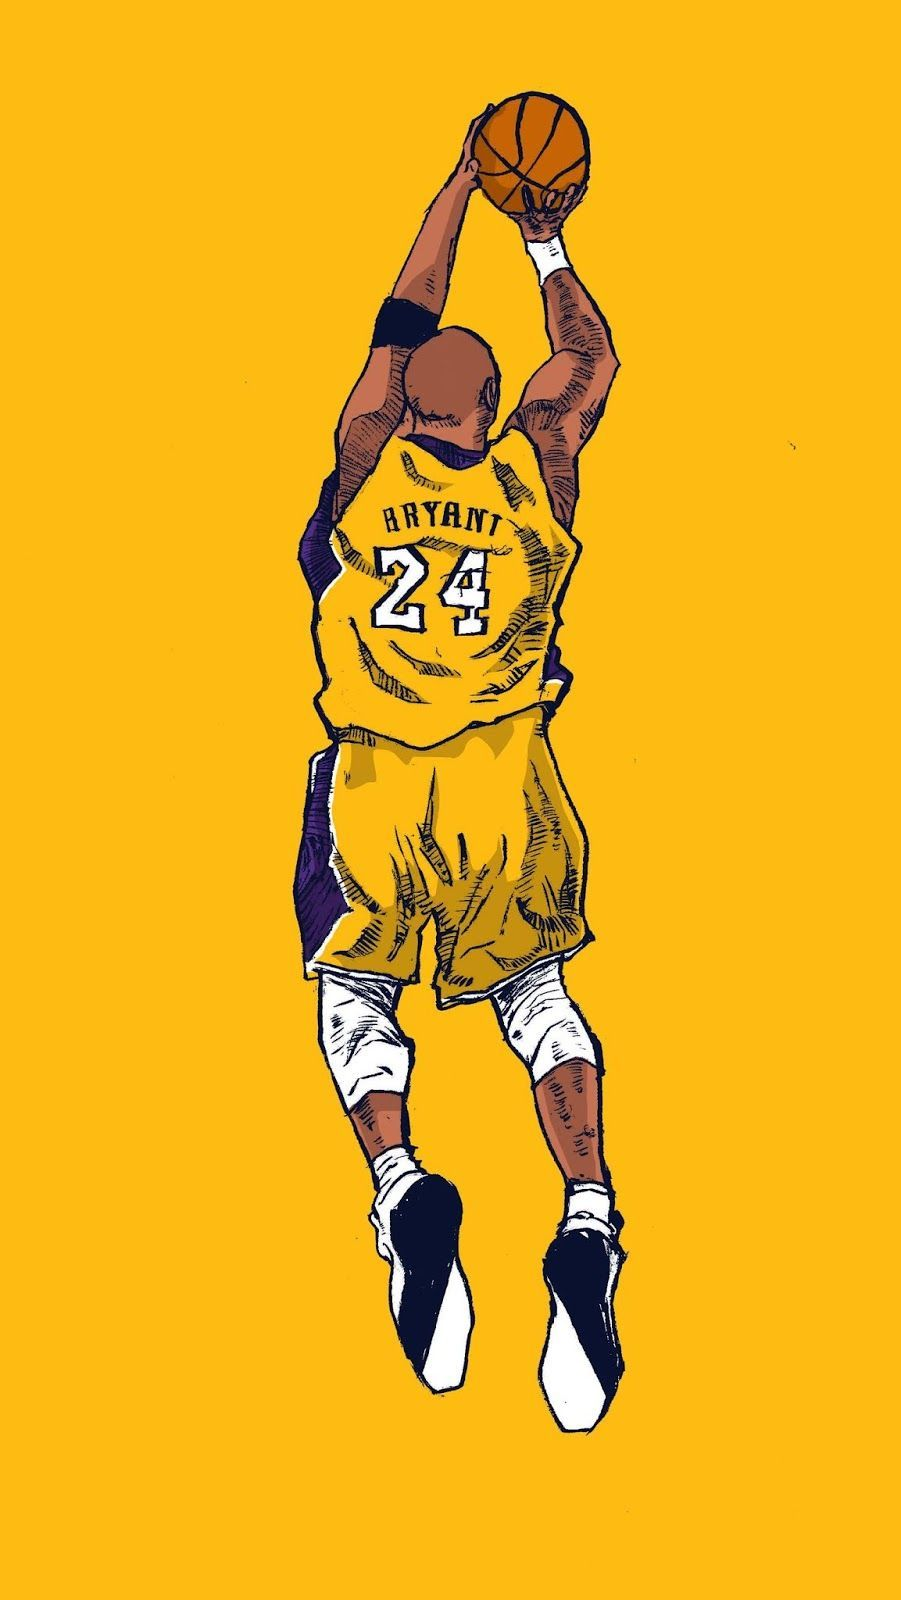 Animated Kobe Bryant Wallpaper : animated, bryant, wallpaper, Bryant, Wallpapers, Backgrounds, WallpaperAccess